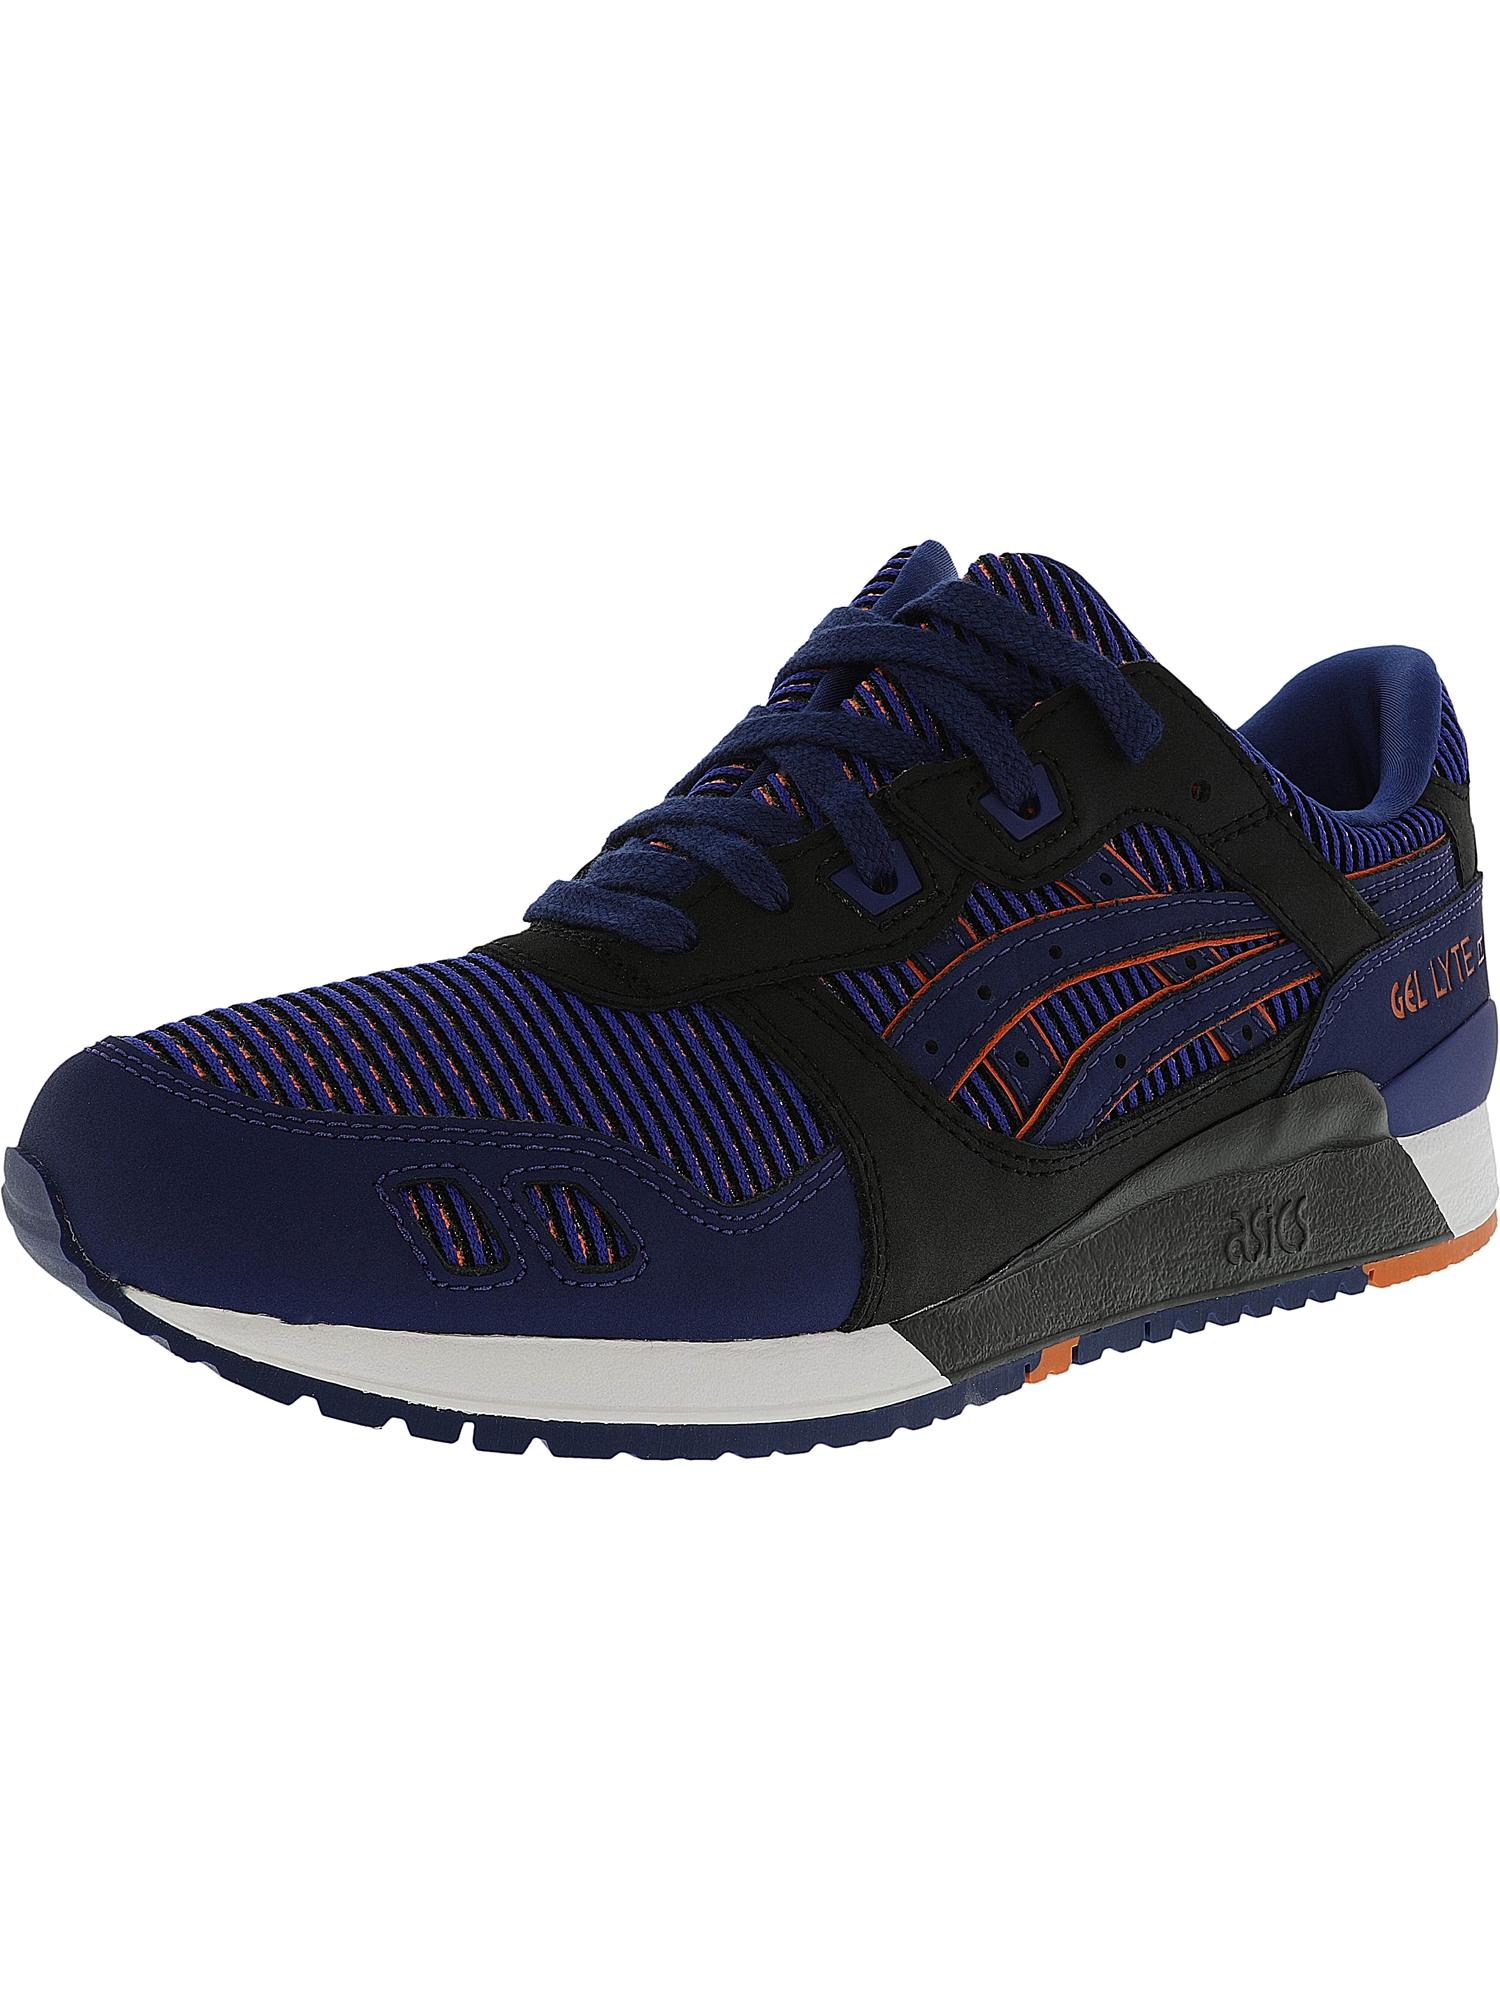 Asics Men's Gel-Lyte 3 Medium Grey / Guava Ankle-High Leather Fashion Sneaker - 11.5M